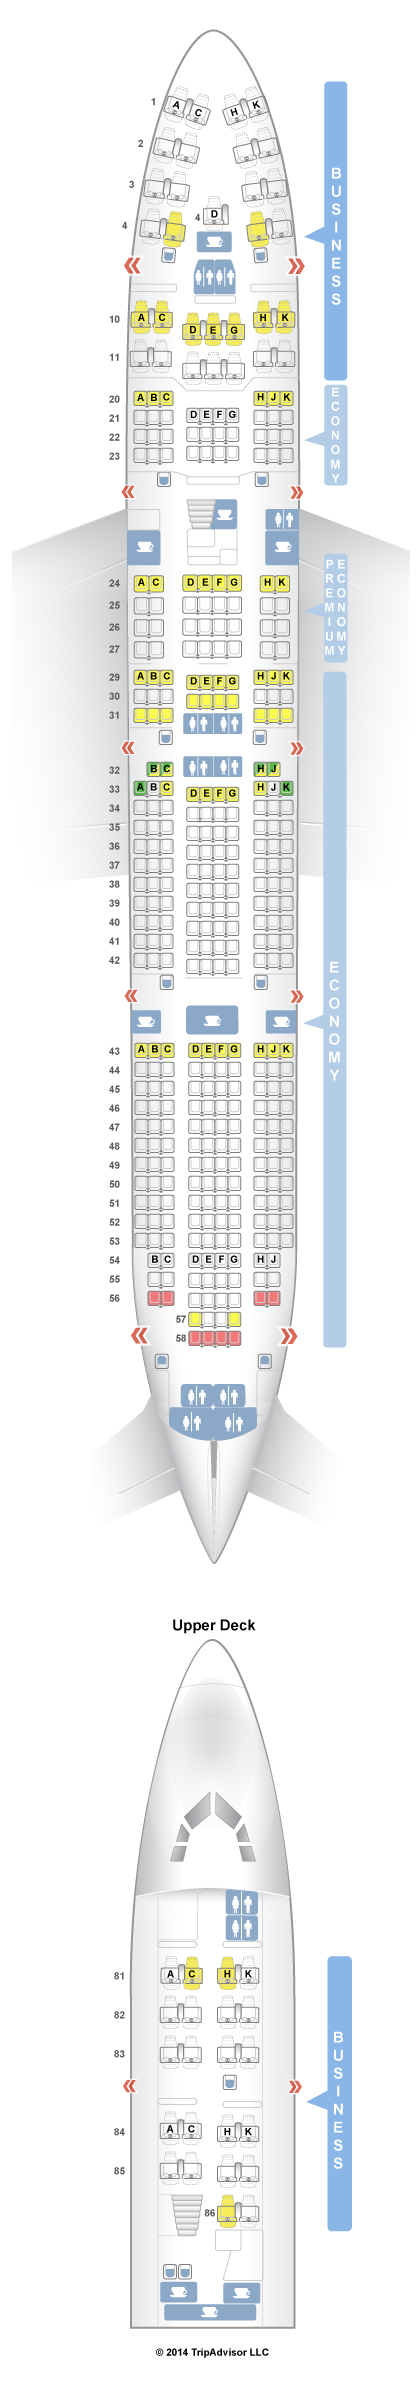 SeatGuru Seat Map Lufthansa Boeing 747 400 (744) V1